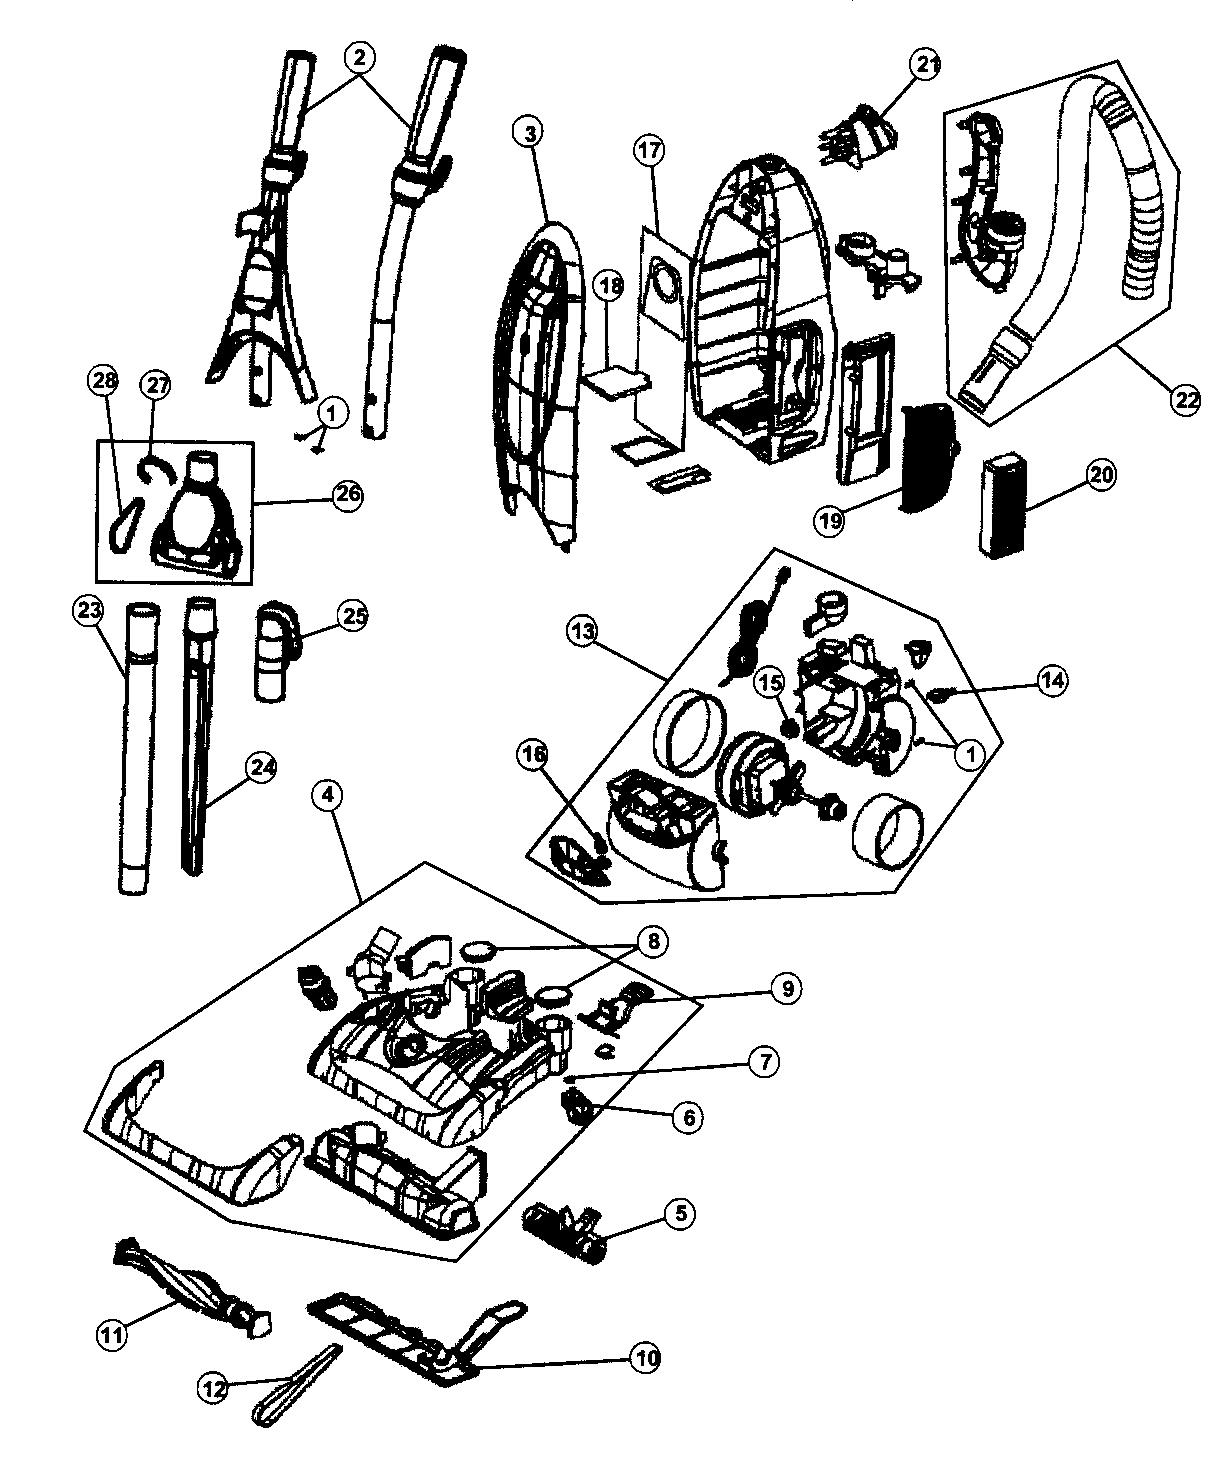 Dirt-Devil model 086010 vacuum, upright genuine parts